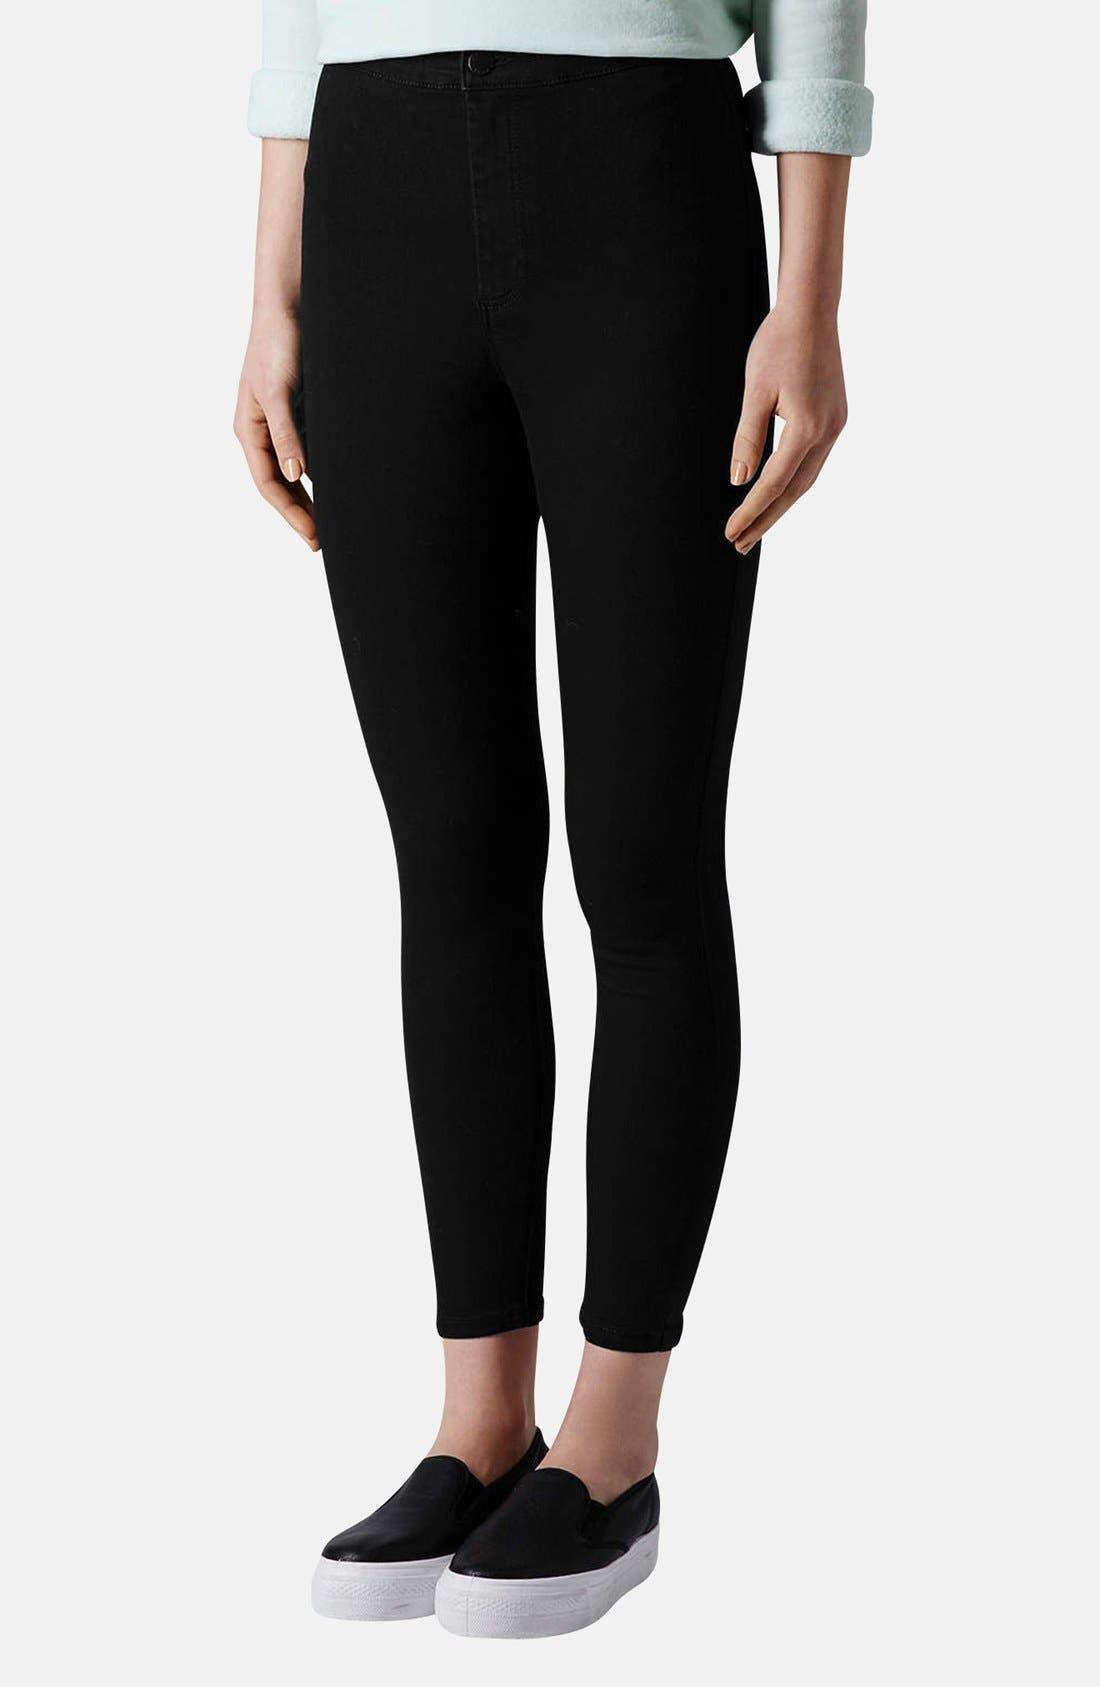 Alternate Image 1 Selected - Topshop Moto 'Joni' High Rise Skinny Jeans